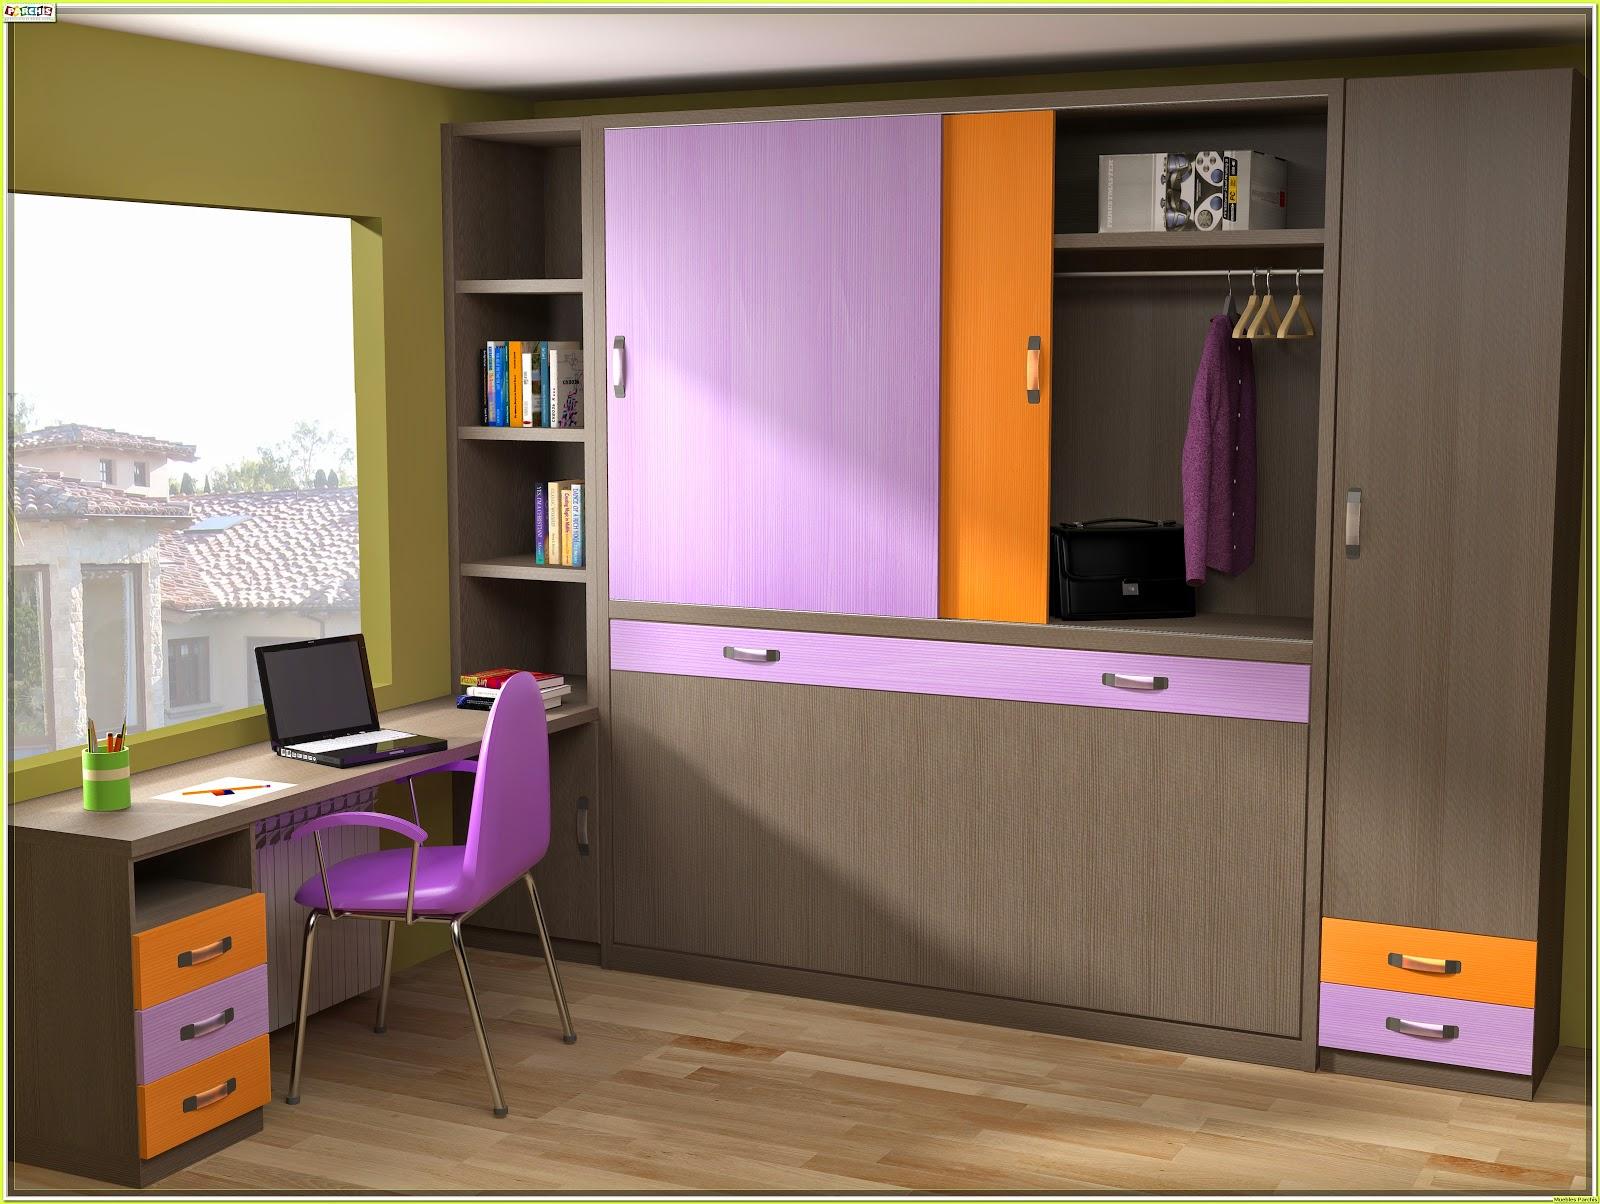 Cama mesa abatible camas autoportantes camas abatibles for Dormitorios juveniles abatibles